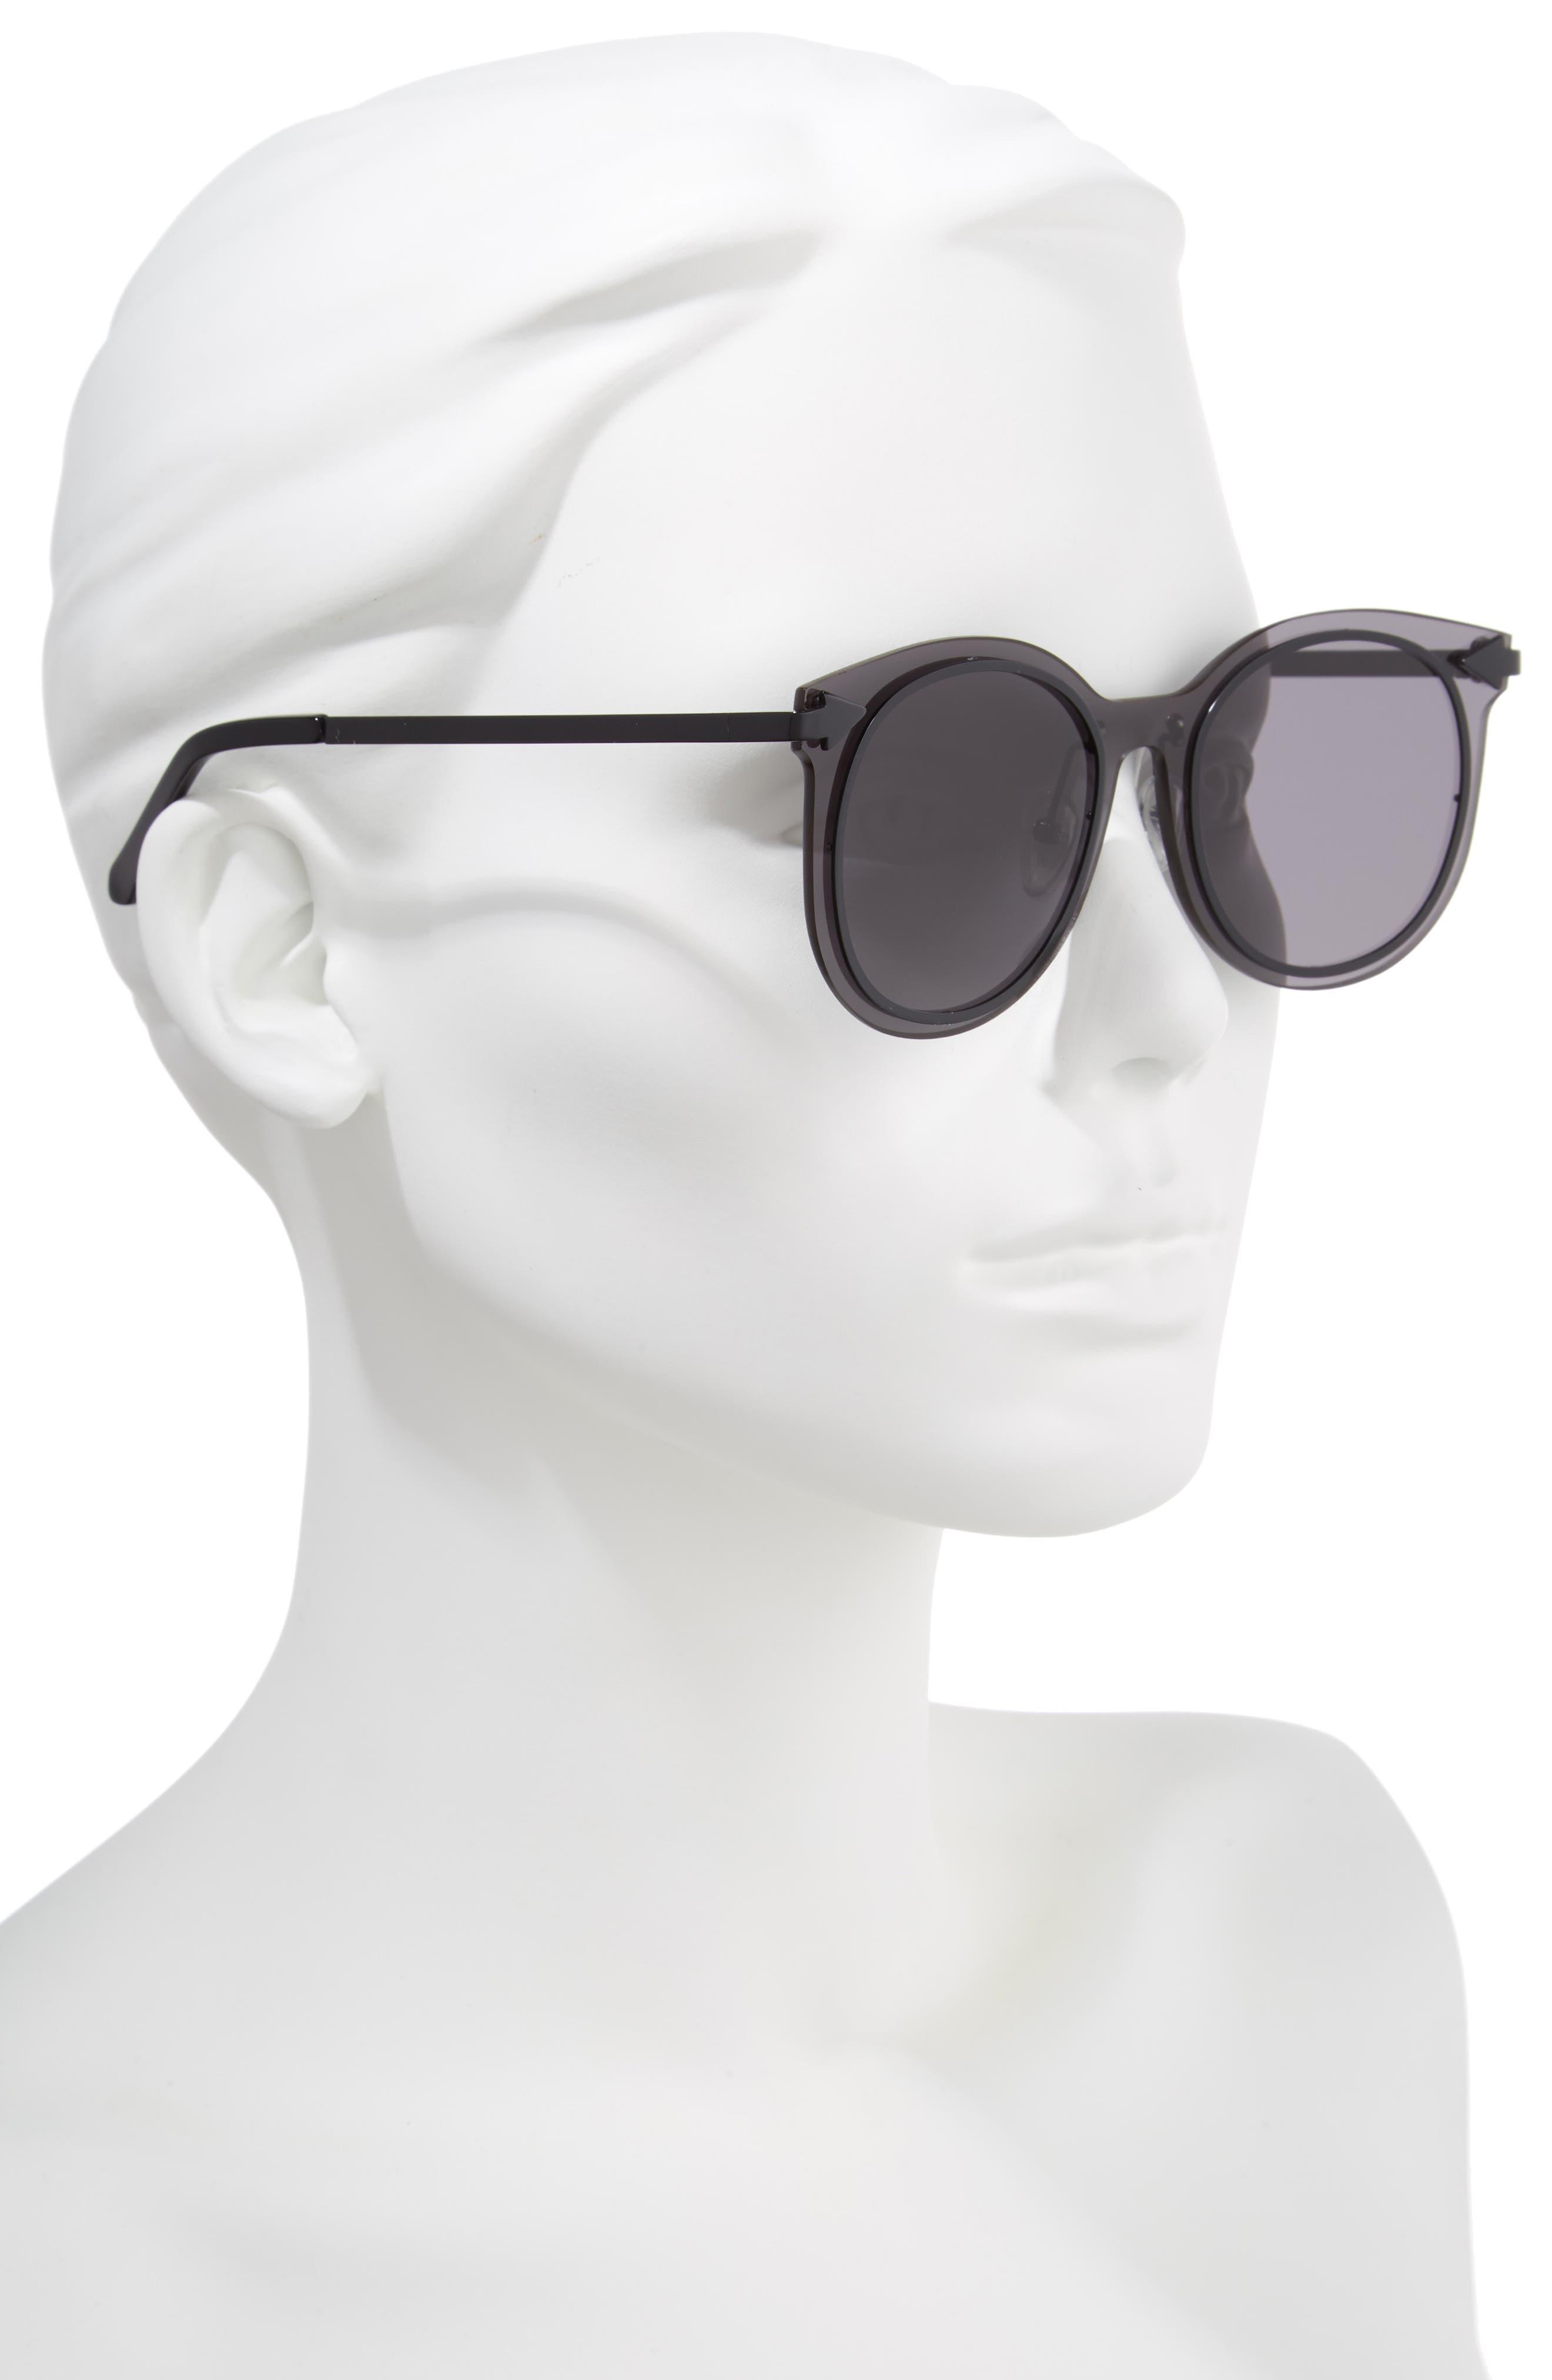 Miss Persimmon 51mm Sunglasses,                             Alternate thumbnail 2, color,                             Black